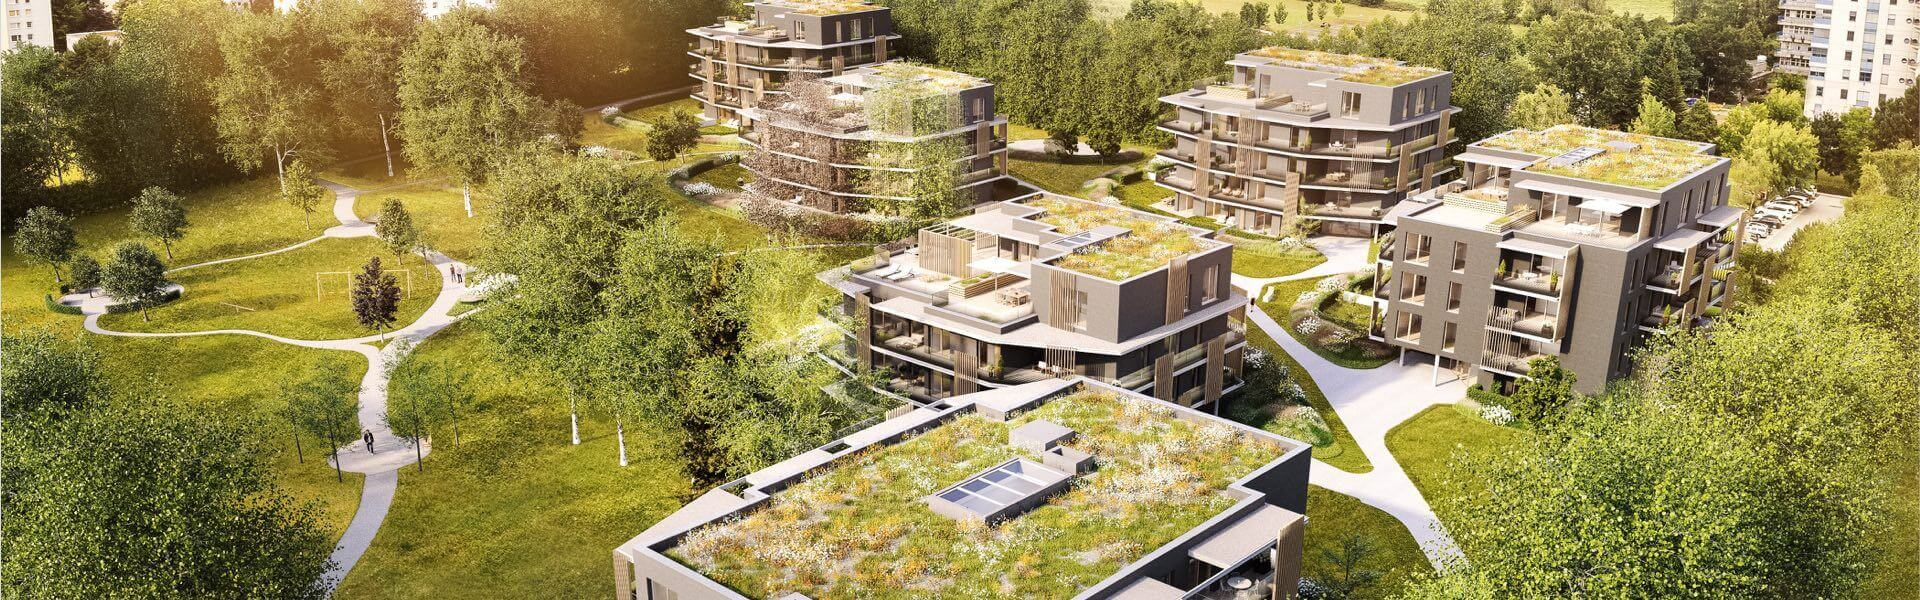 Smart Home im Wohnbau mit Loxone